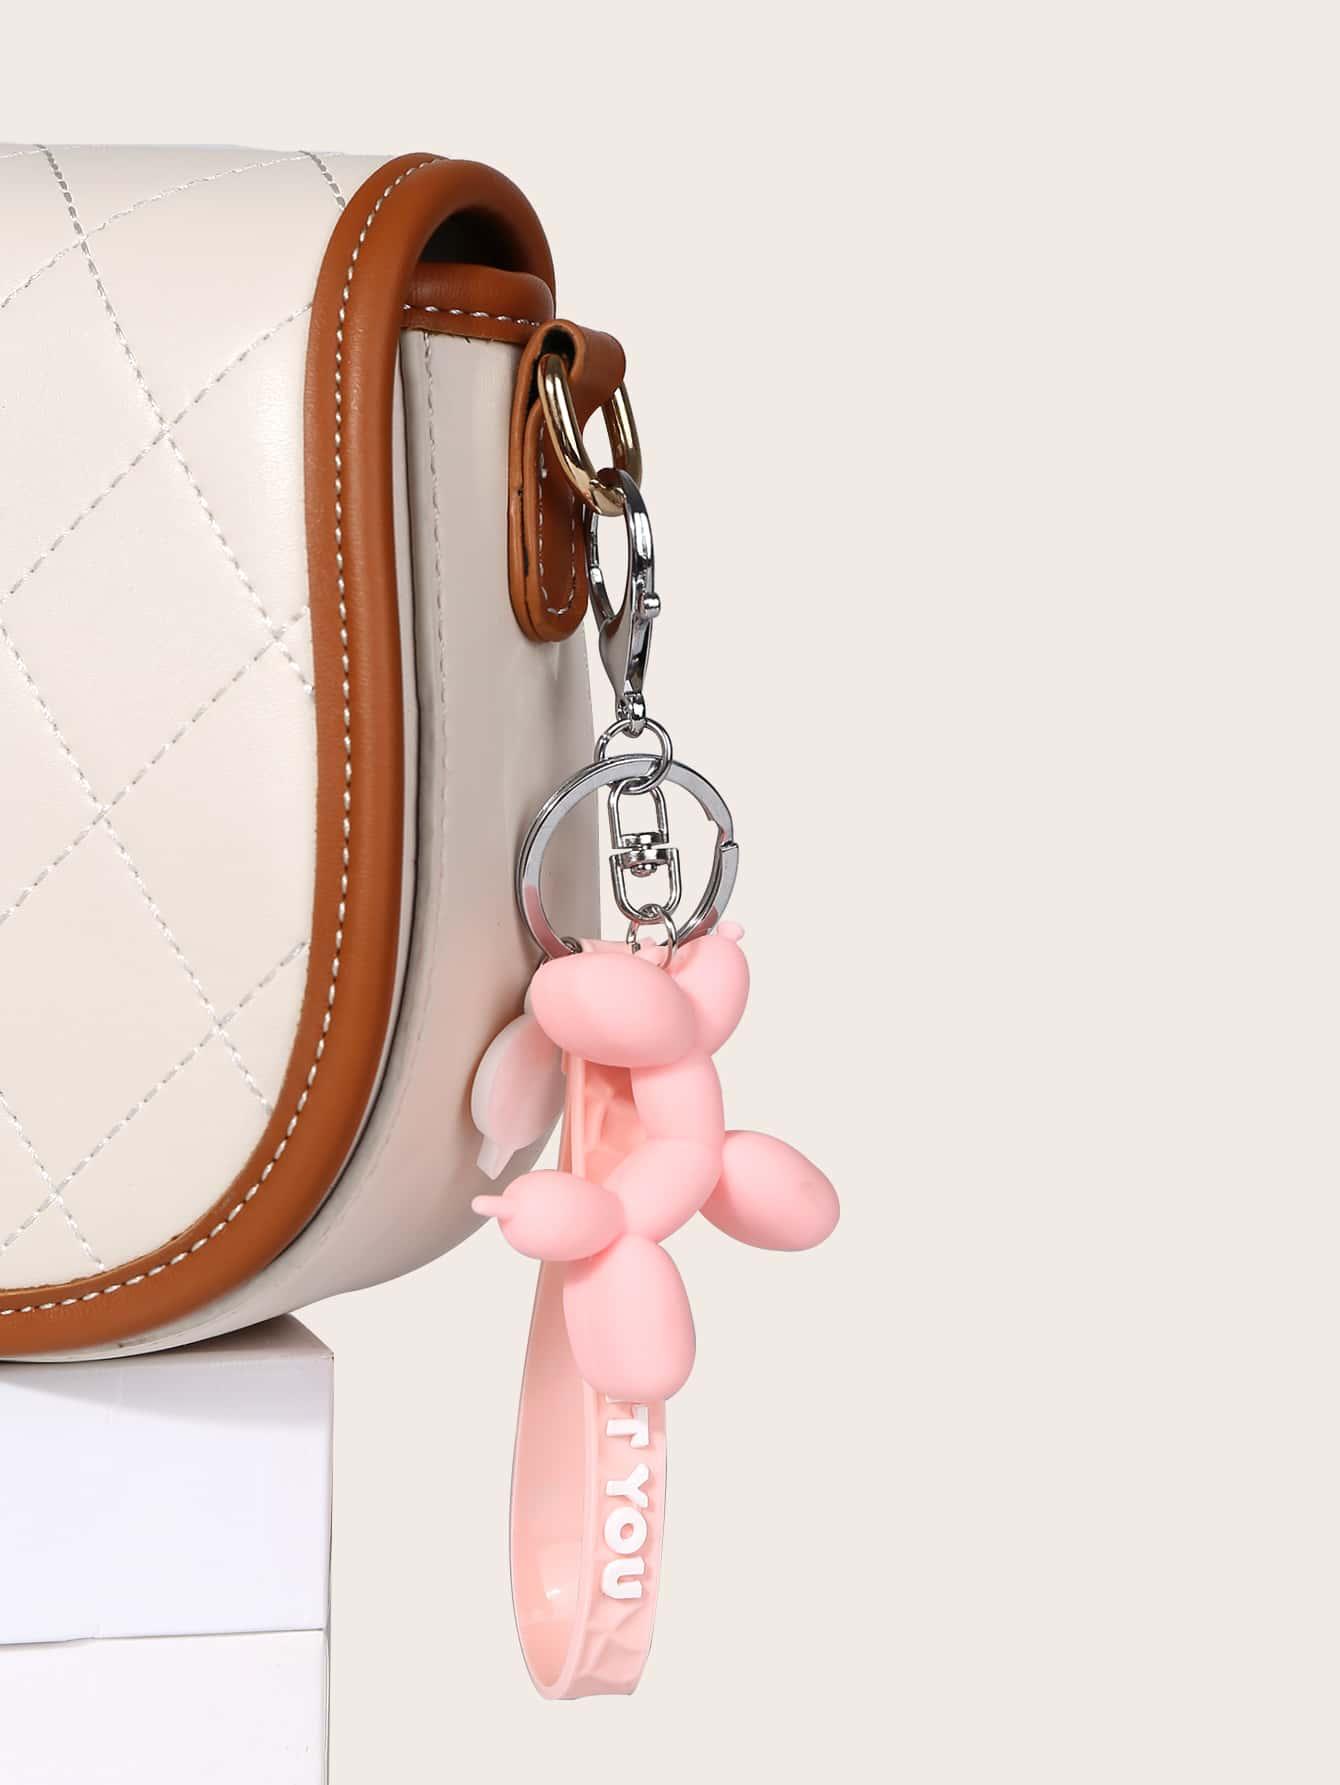 Подвеска для сумки в форме собакиswbag18200522467